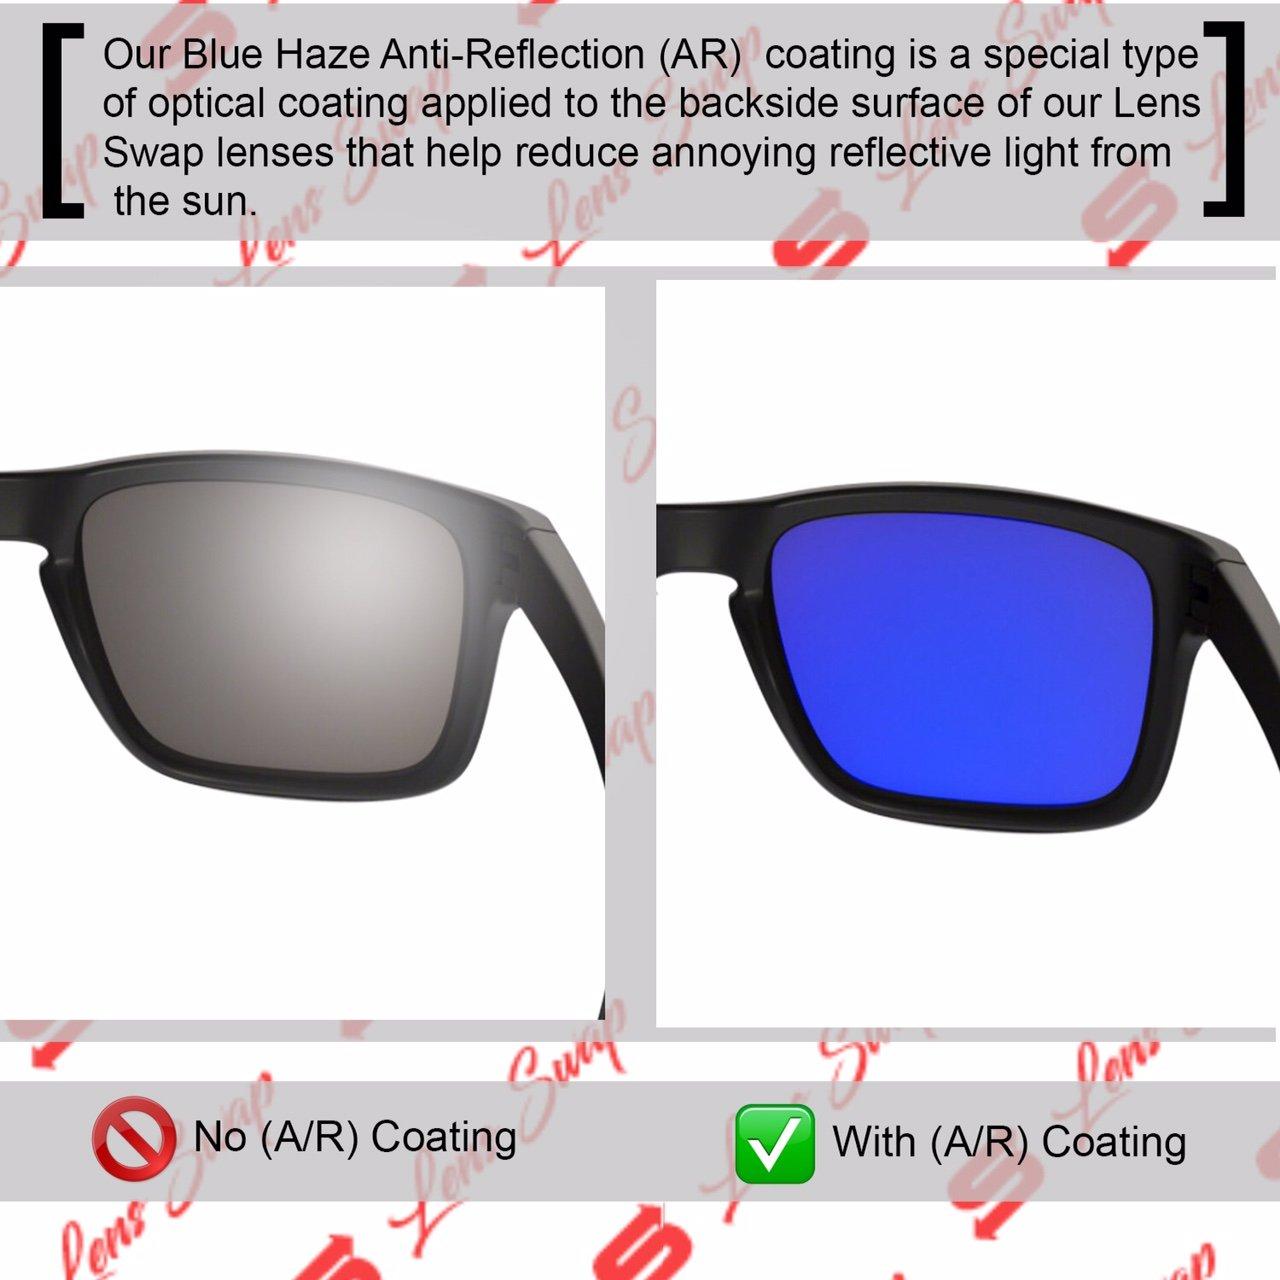 262efc7e68ec Amazon.com  Lens Swap Dark ICE Blue Oakley Holbrook Lenses Polarized  Quality   FITS Perfectly  Shoes